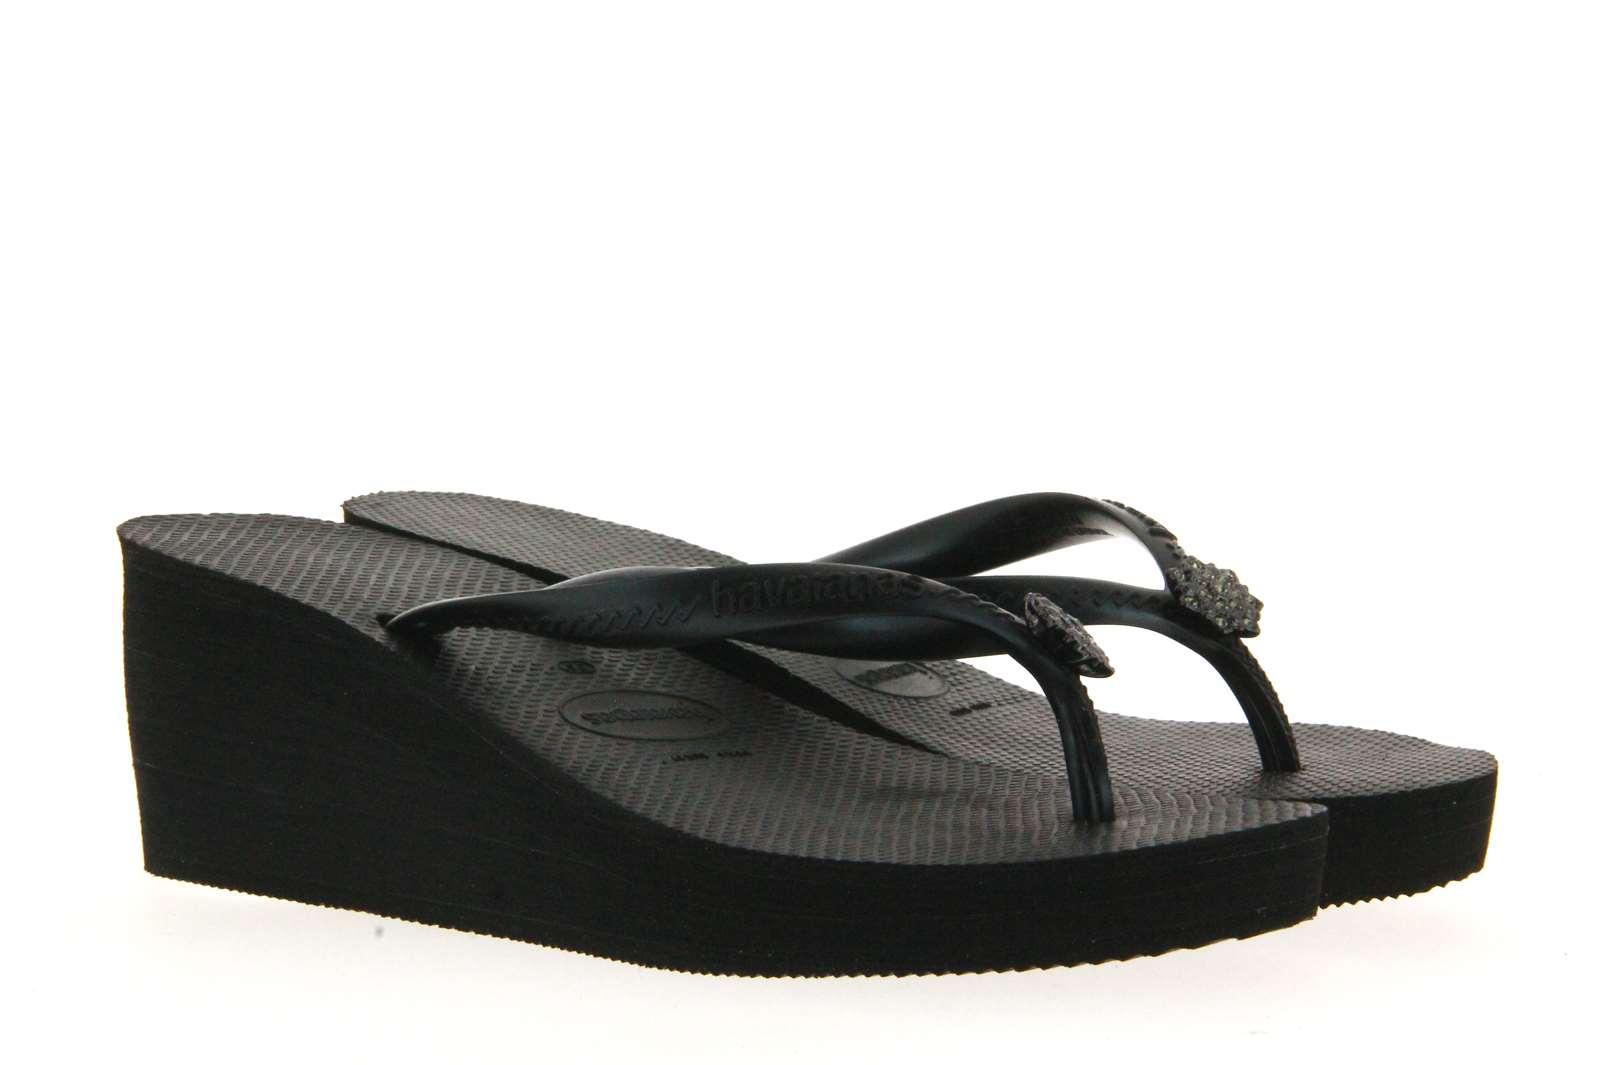 Havaianas toe sandals HIGH FASHION POEM BLACK